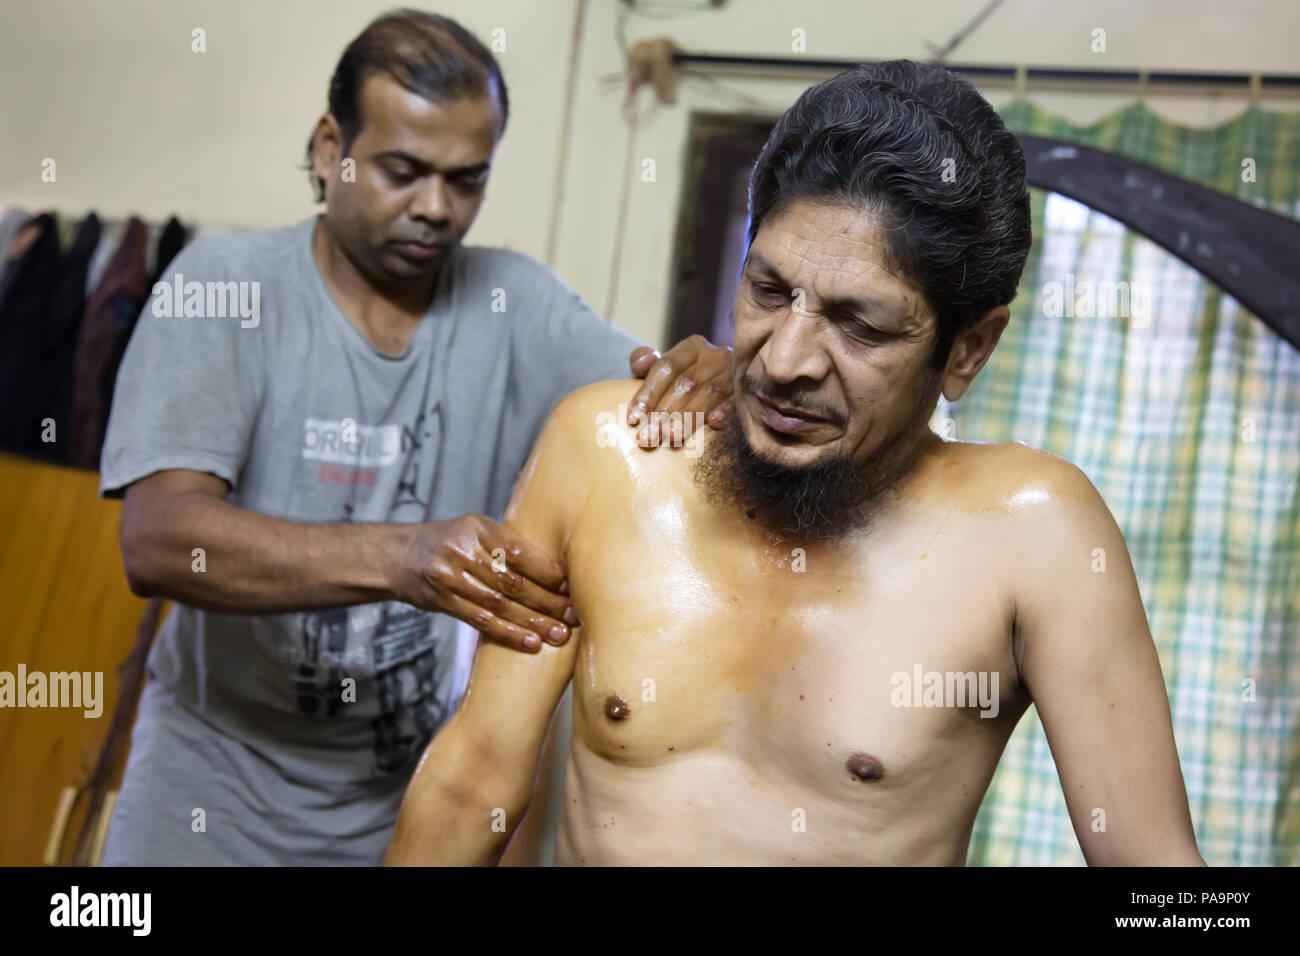 Ayurvedic treatment of ill people at Sambhavna Trust Clinic in Bhopal , India - Stock Image